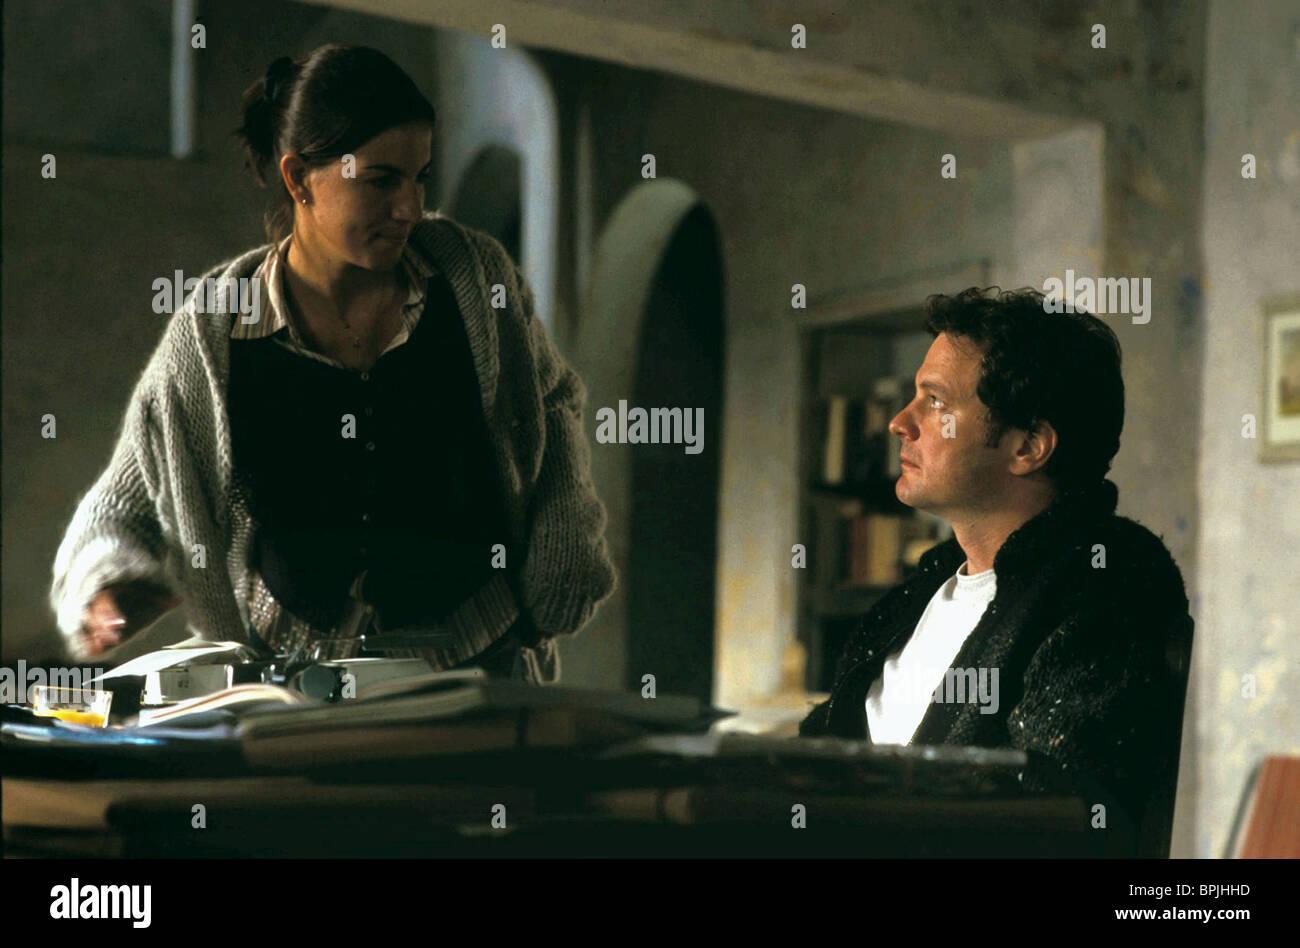 LUCIA MONIZ & COLIN FIRTH LOVE ACTUALLY (2003) - Stock Image